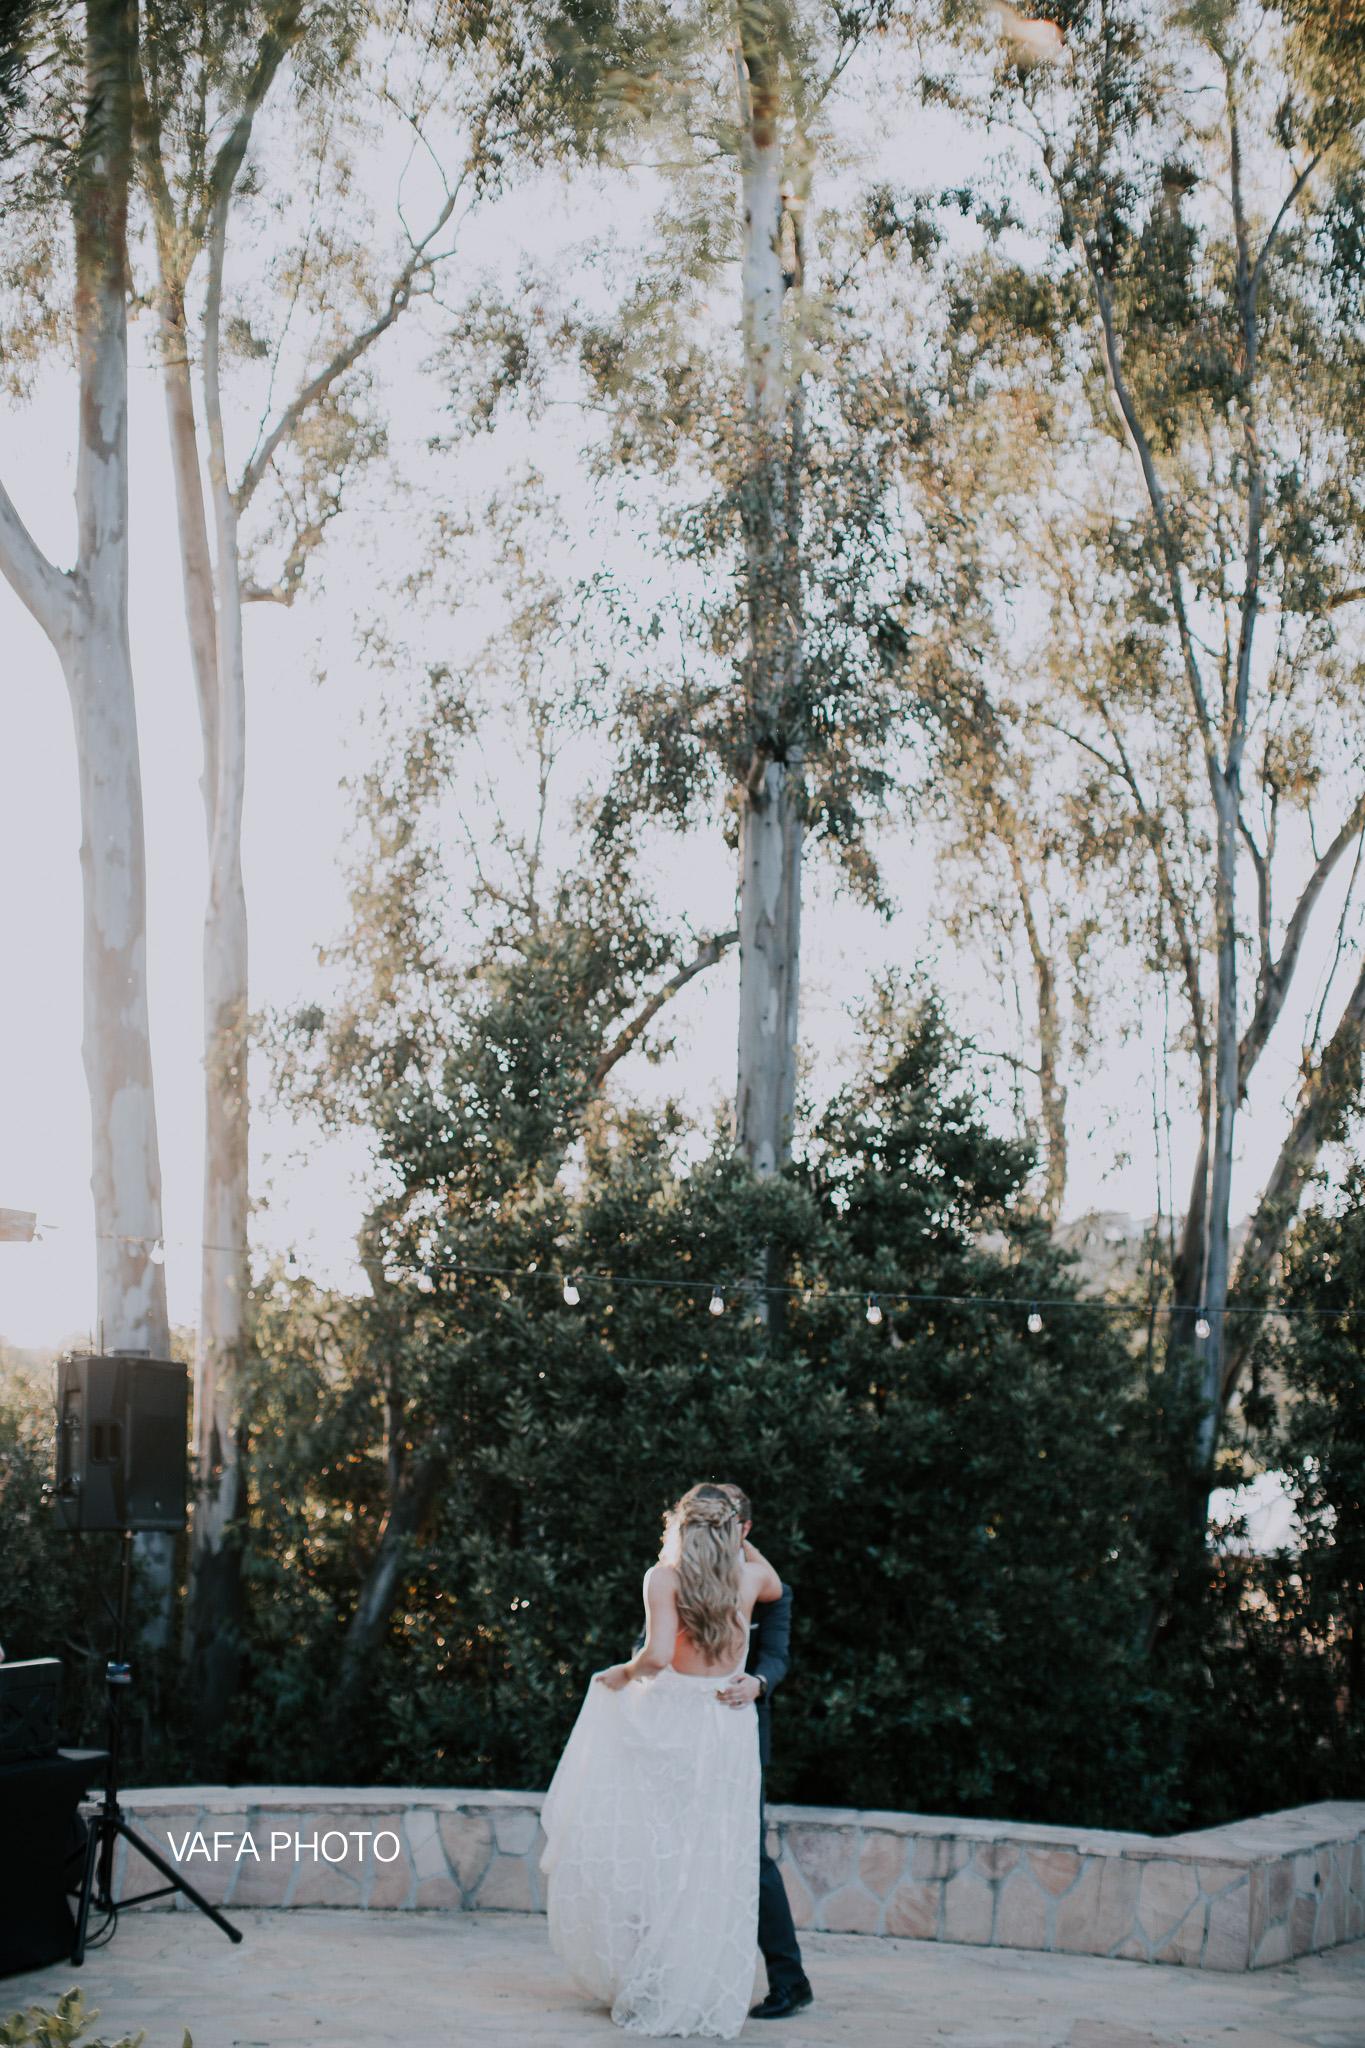 Leo-Carrillo-Ranch-Wedding-Lauren-Mike-Vafa-Photo-912.jpg